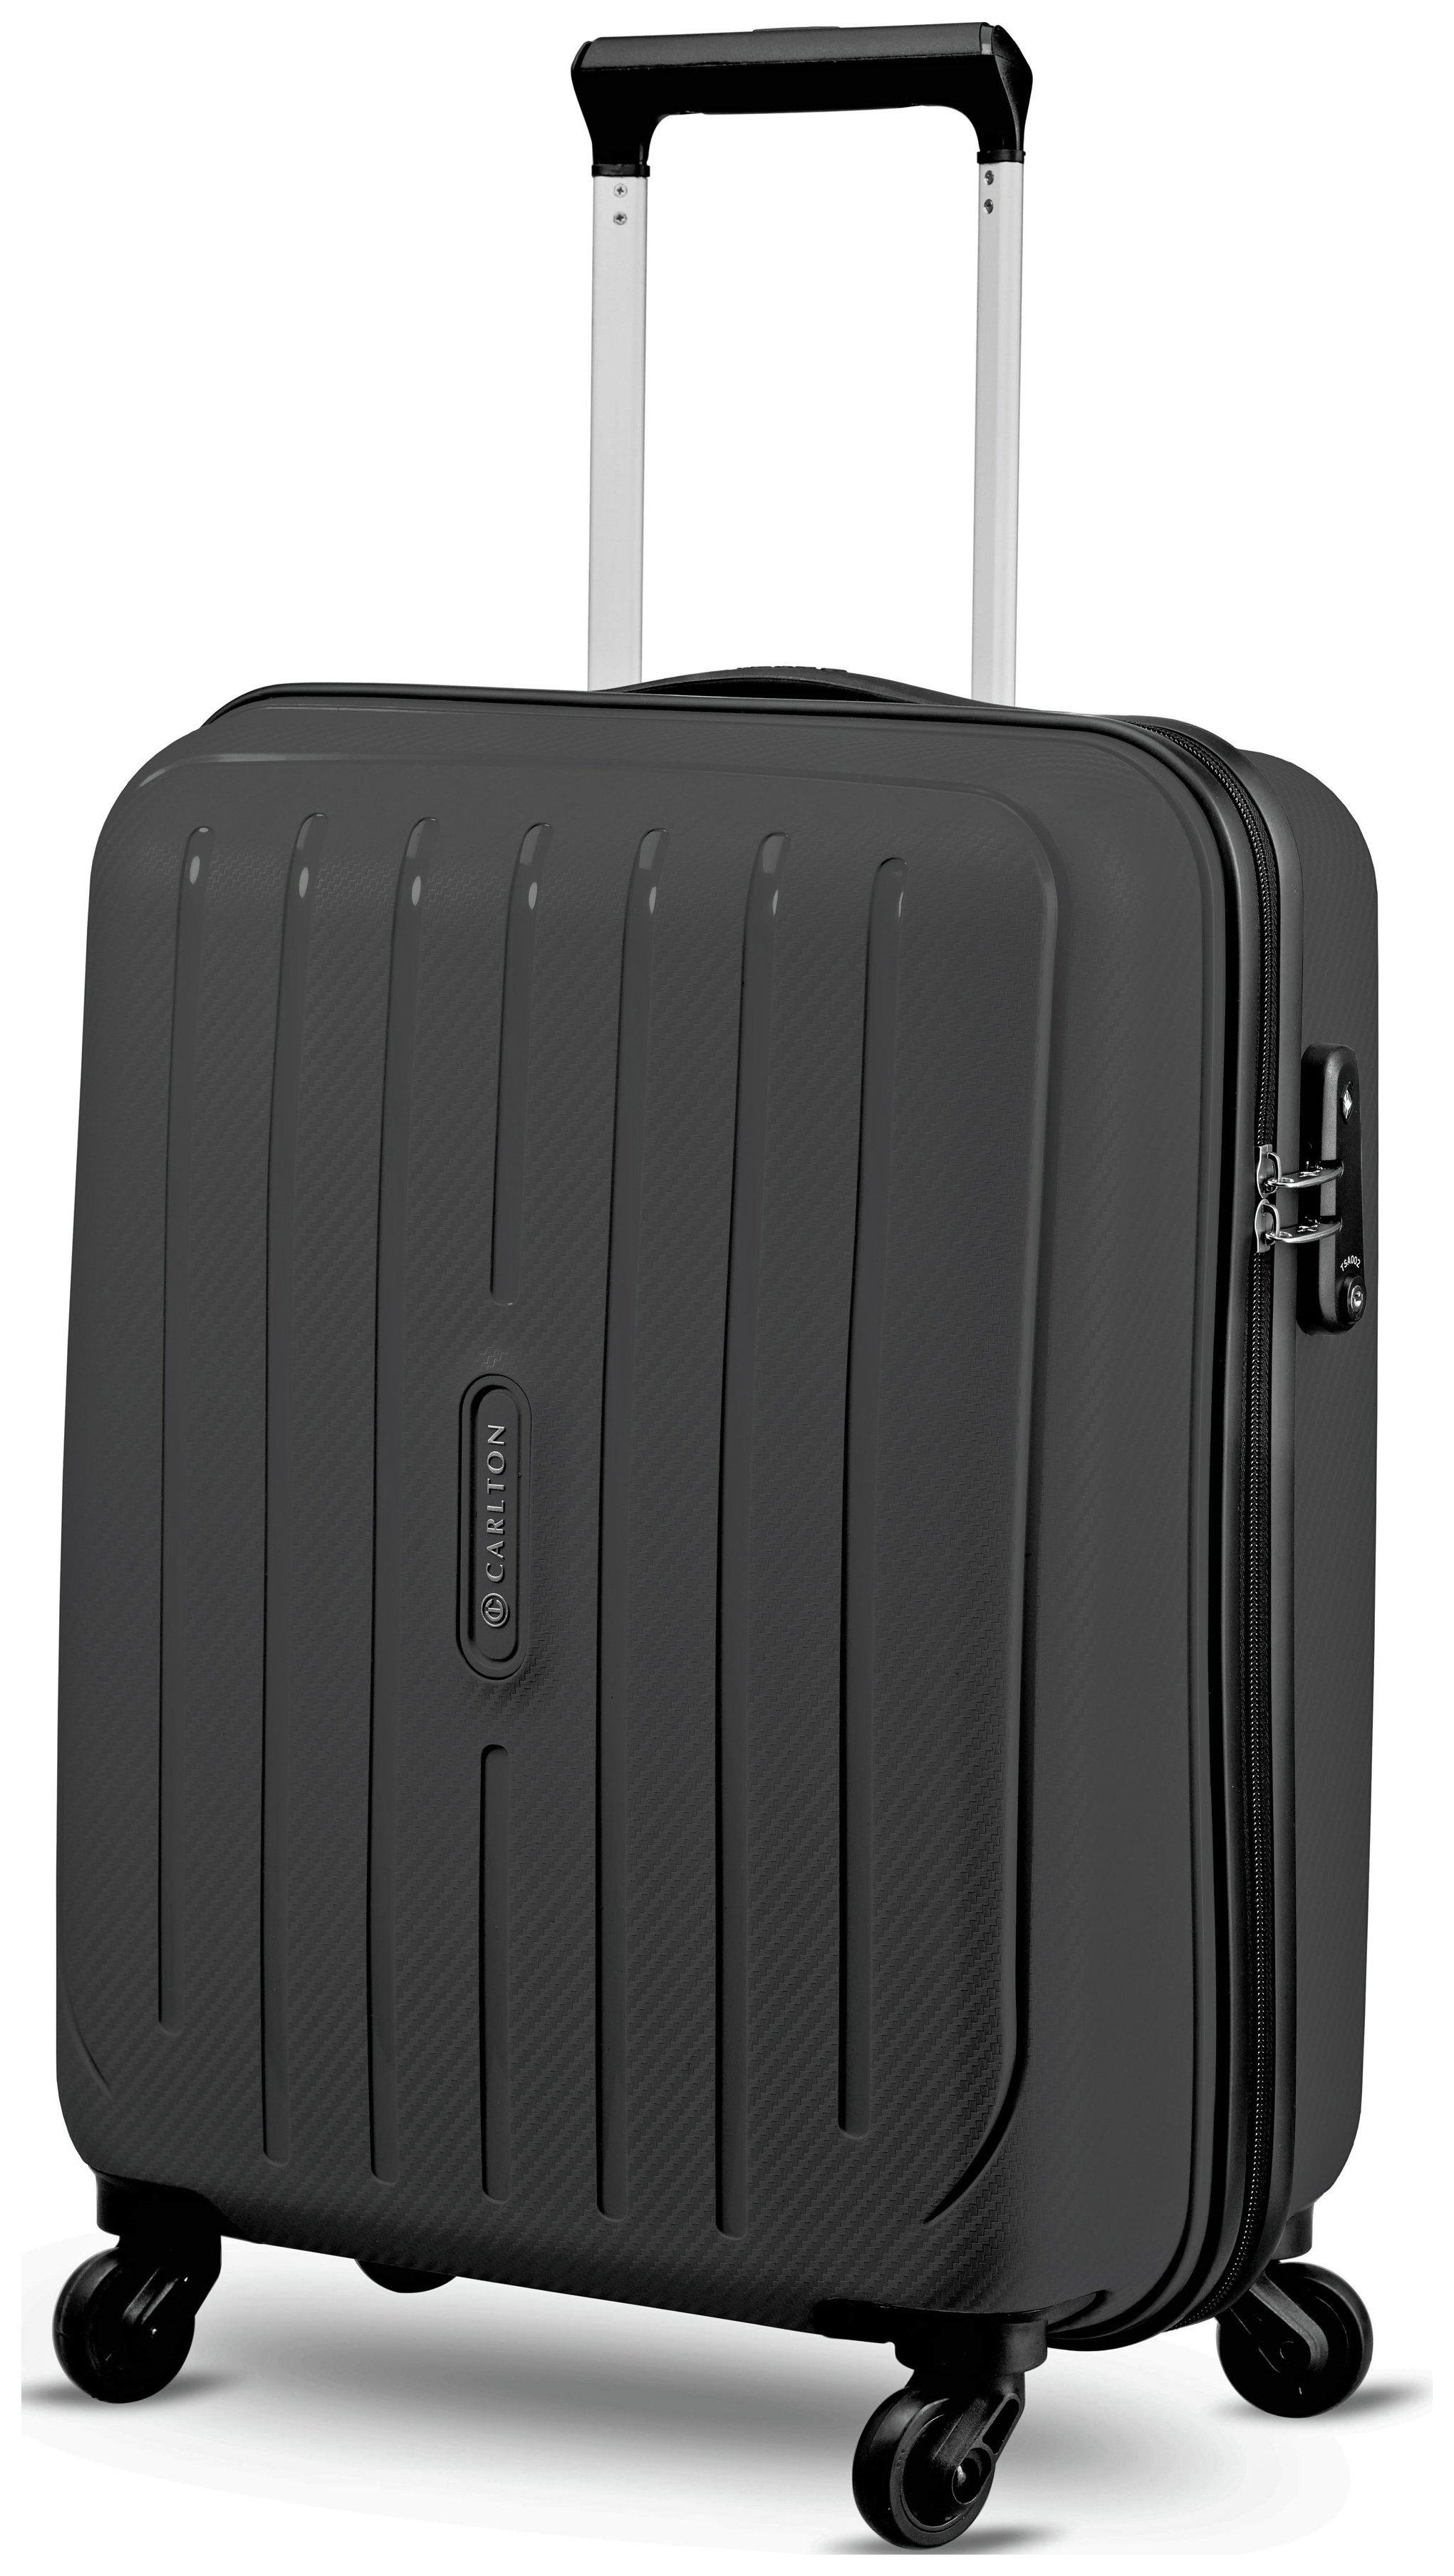 Image of Carlton - Pheonix Small 4 Wheel Hard Suitcase - Black